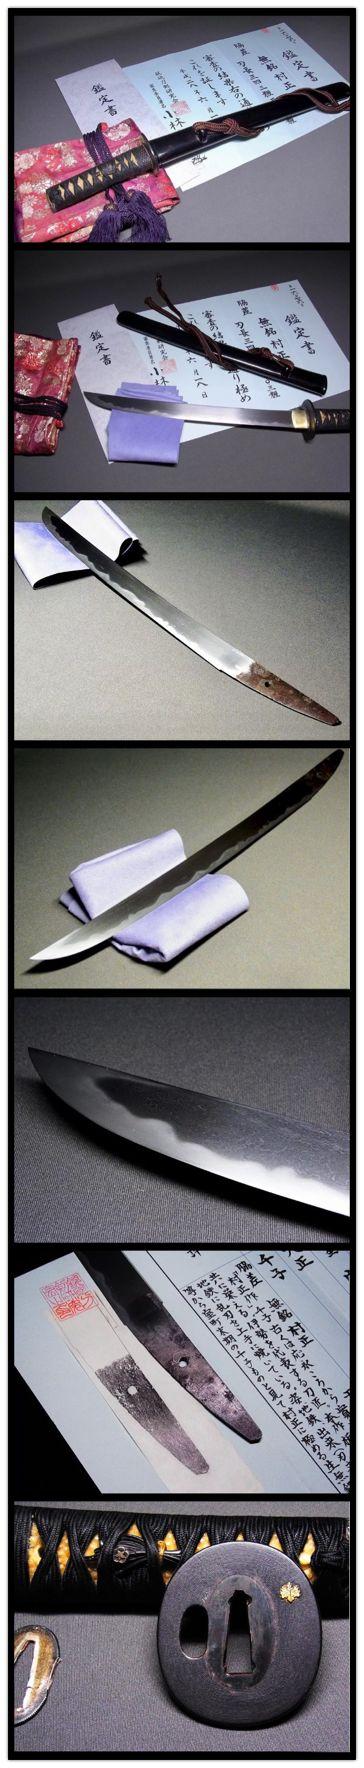 Authentic Muramasa Sword